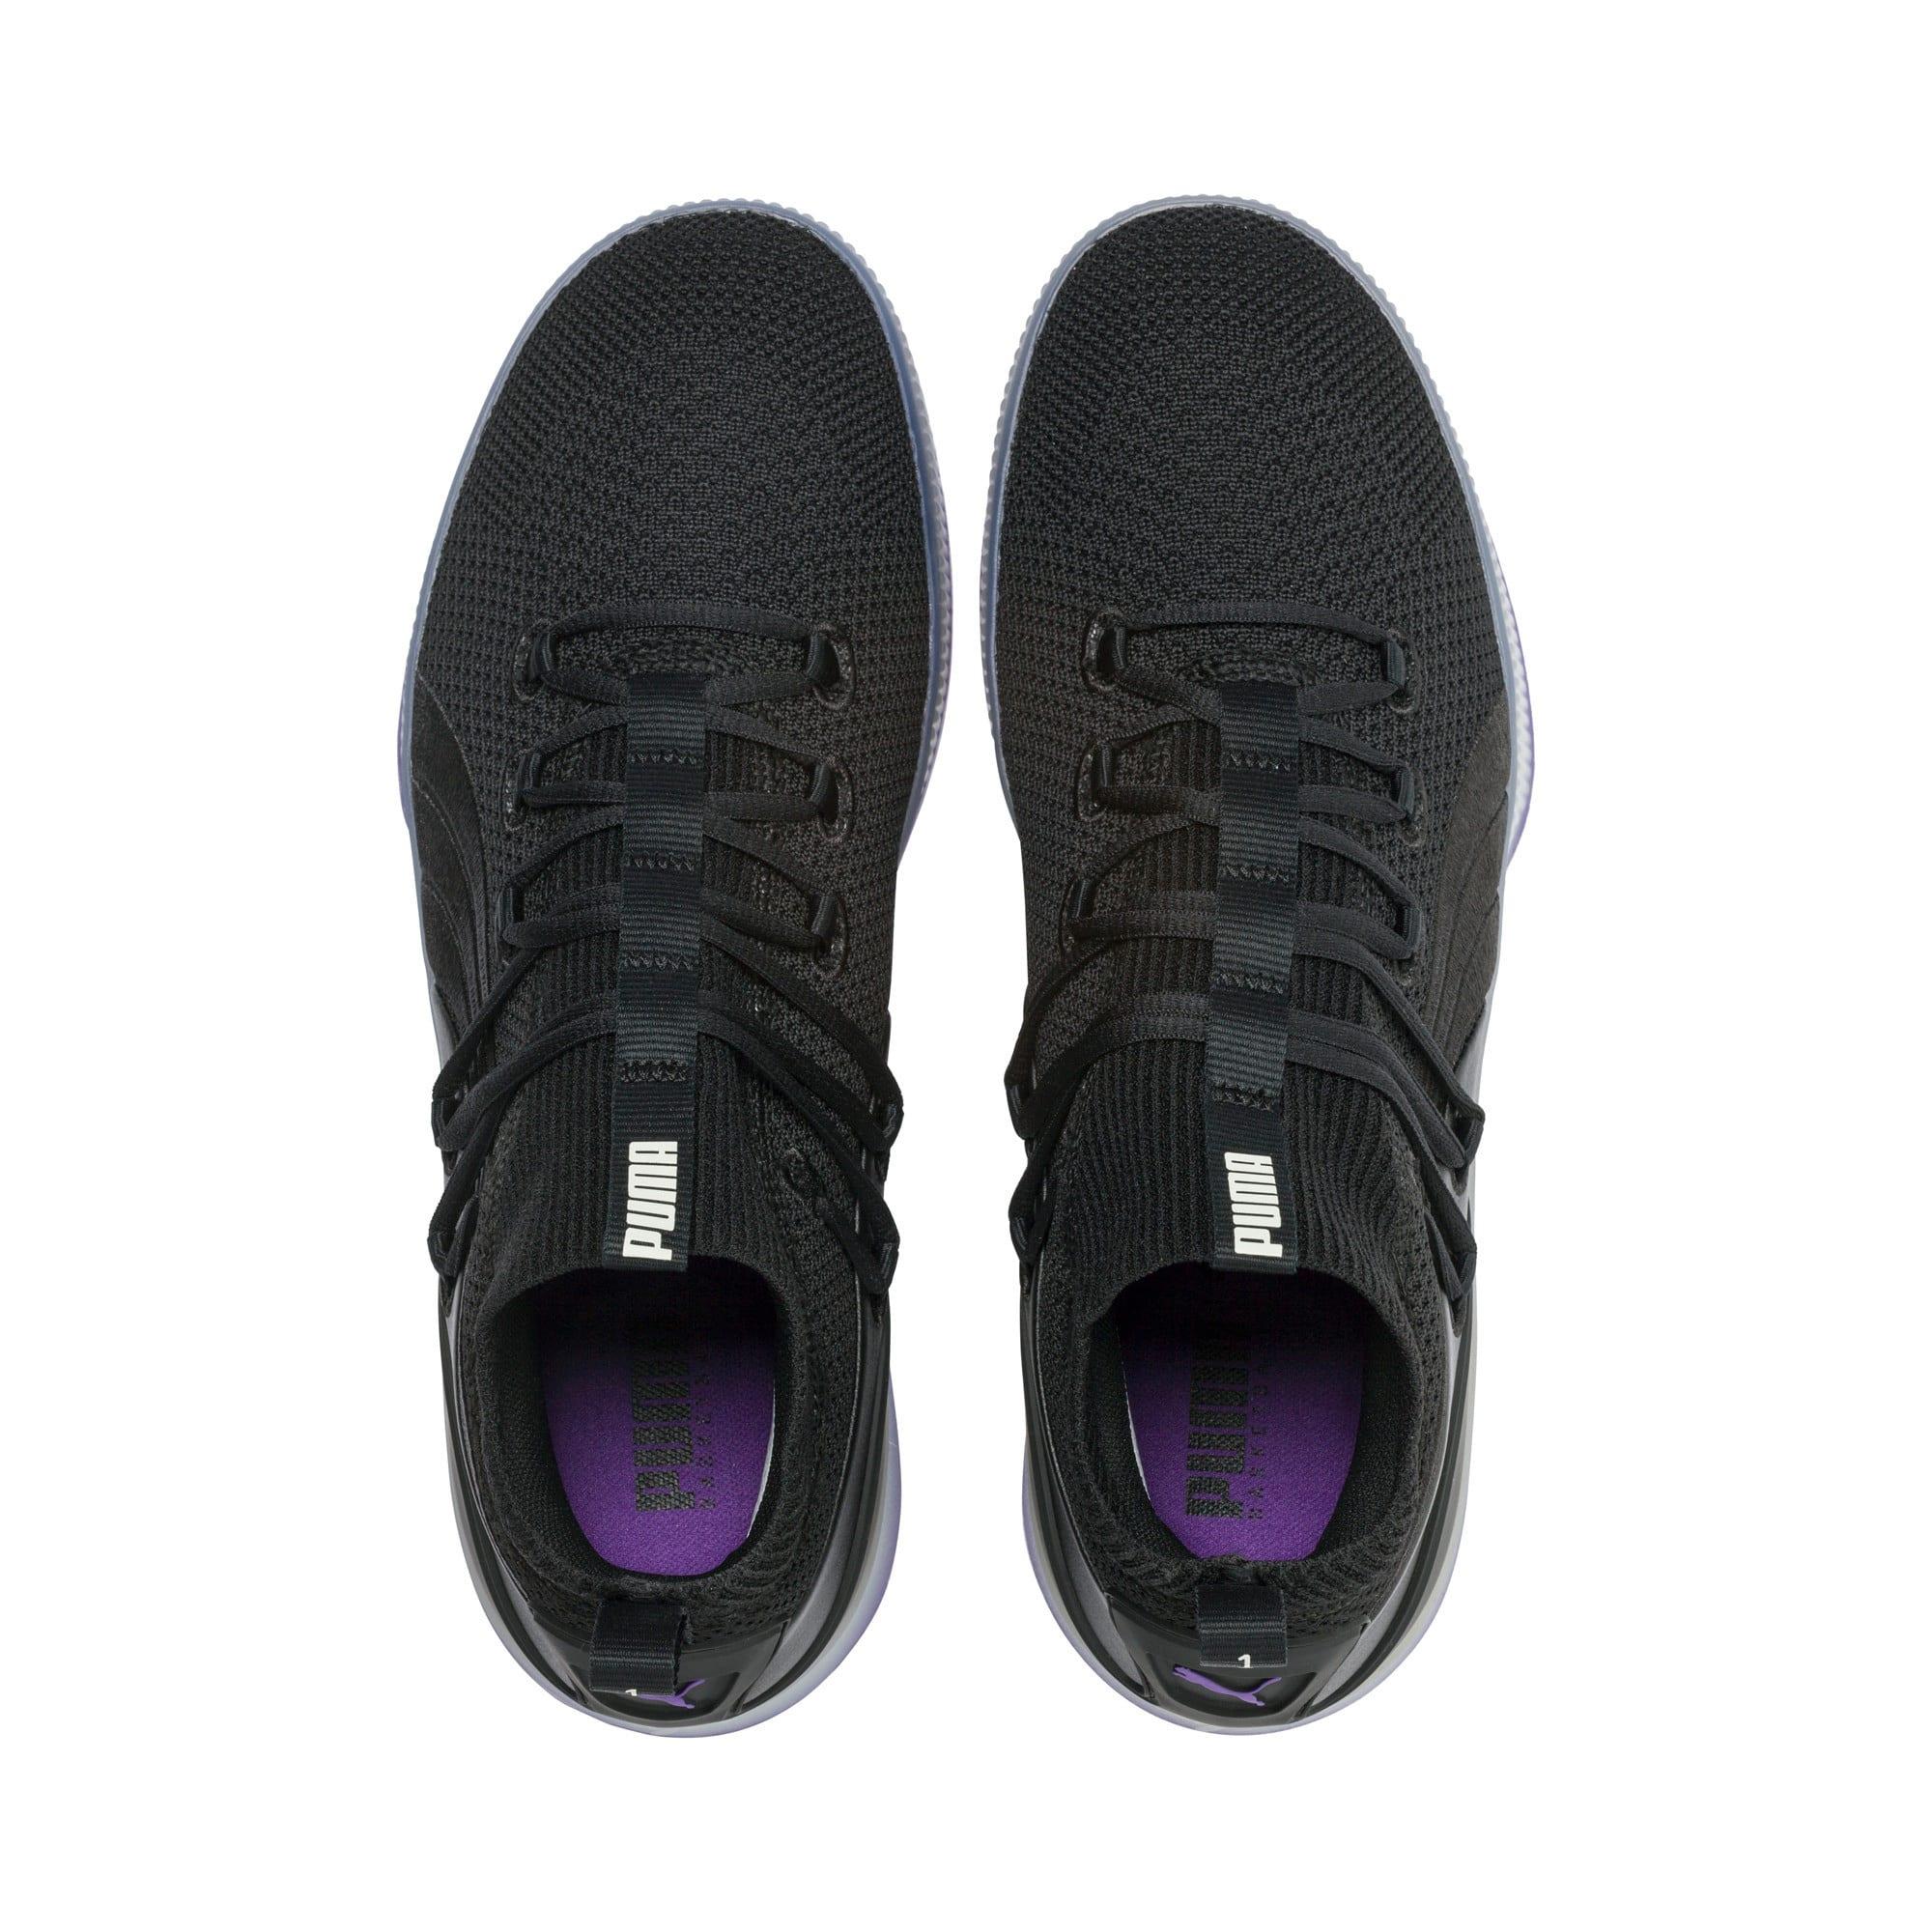 Thumbnail 6 van Clyde Court Disrupt basketball-schoenen voor mannen, Puma Black-ELECTRIC PURPLE, medium